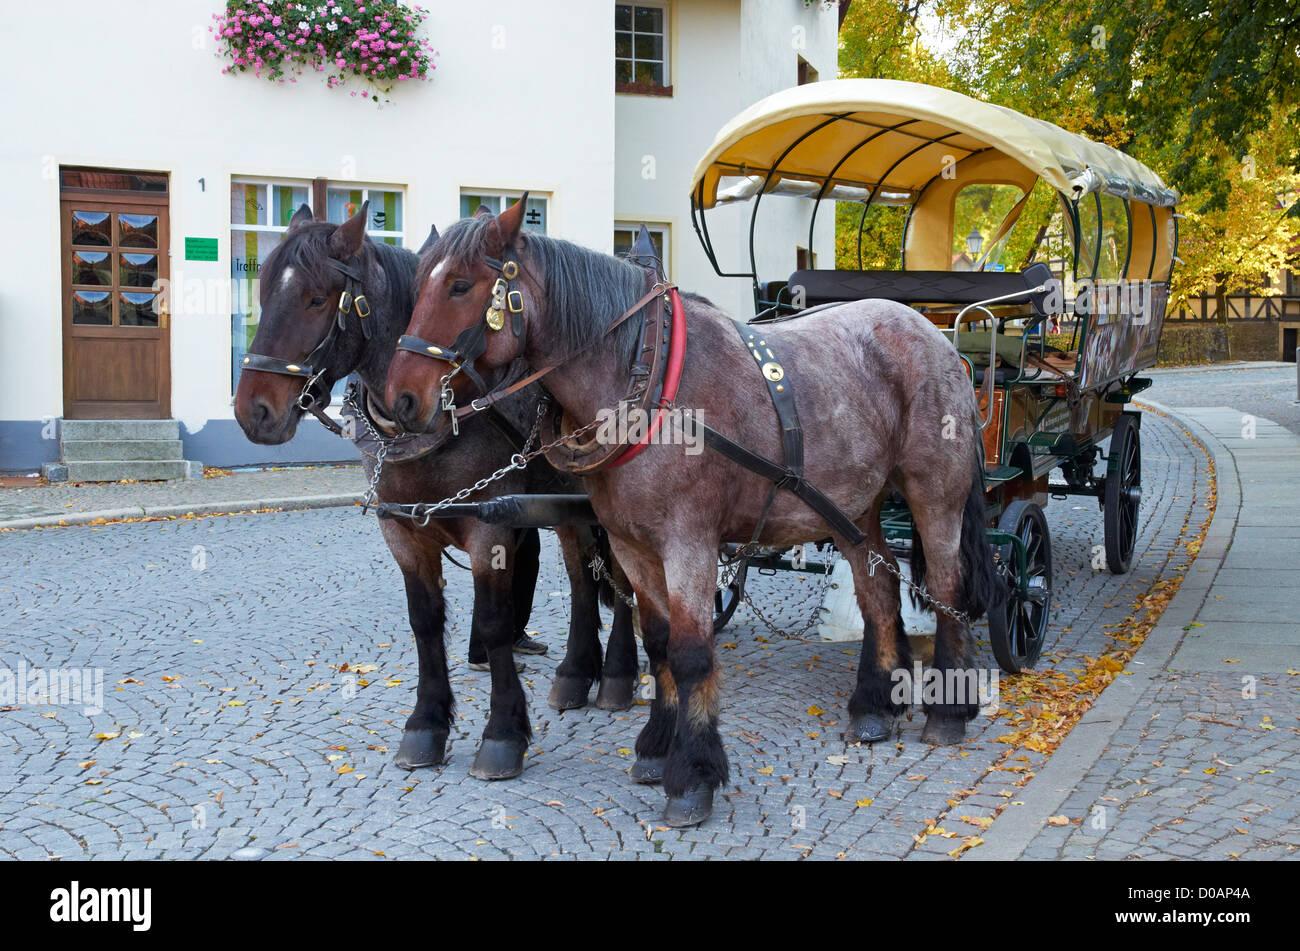 Wernigerode, Sachsen-Anhalt, Germany. Horse-drawn bus providing tours of the town. Pferde-Bus fur stadt fahrt. - Stock Image